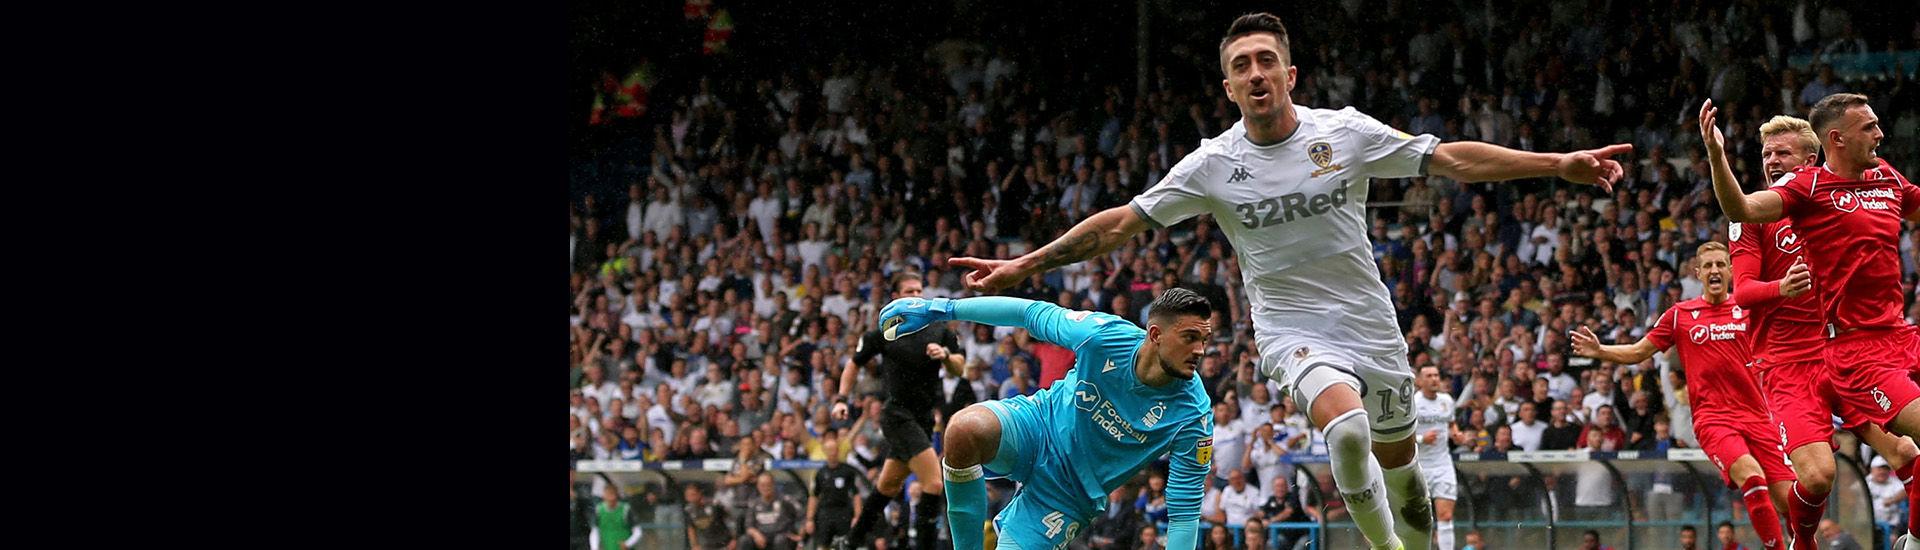 Report: Leeds United 1-1 Nottingham Forest - Leeds United